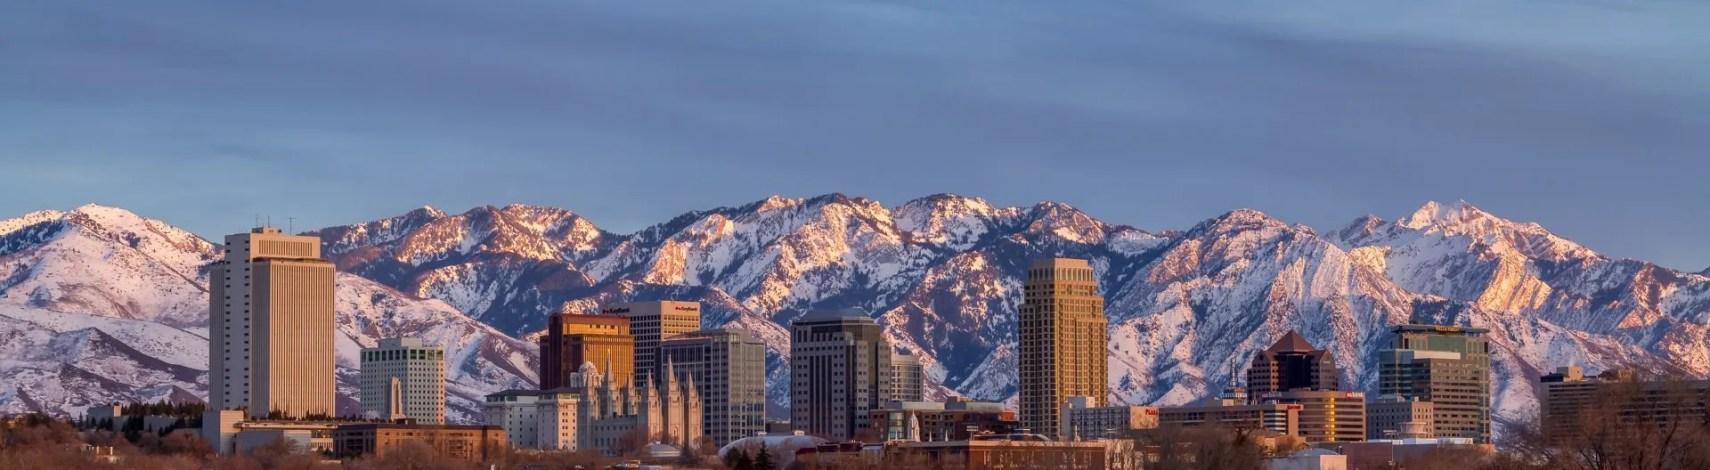 Salt Lake City Skyline Panorama - Utah Urban Panoramic Photography